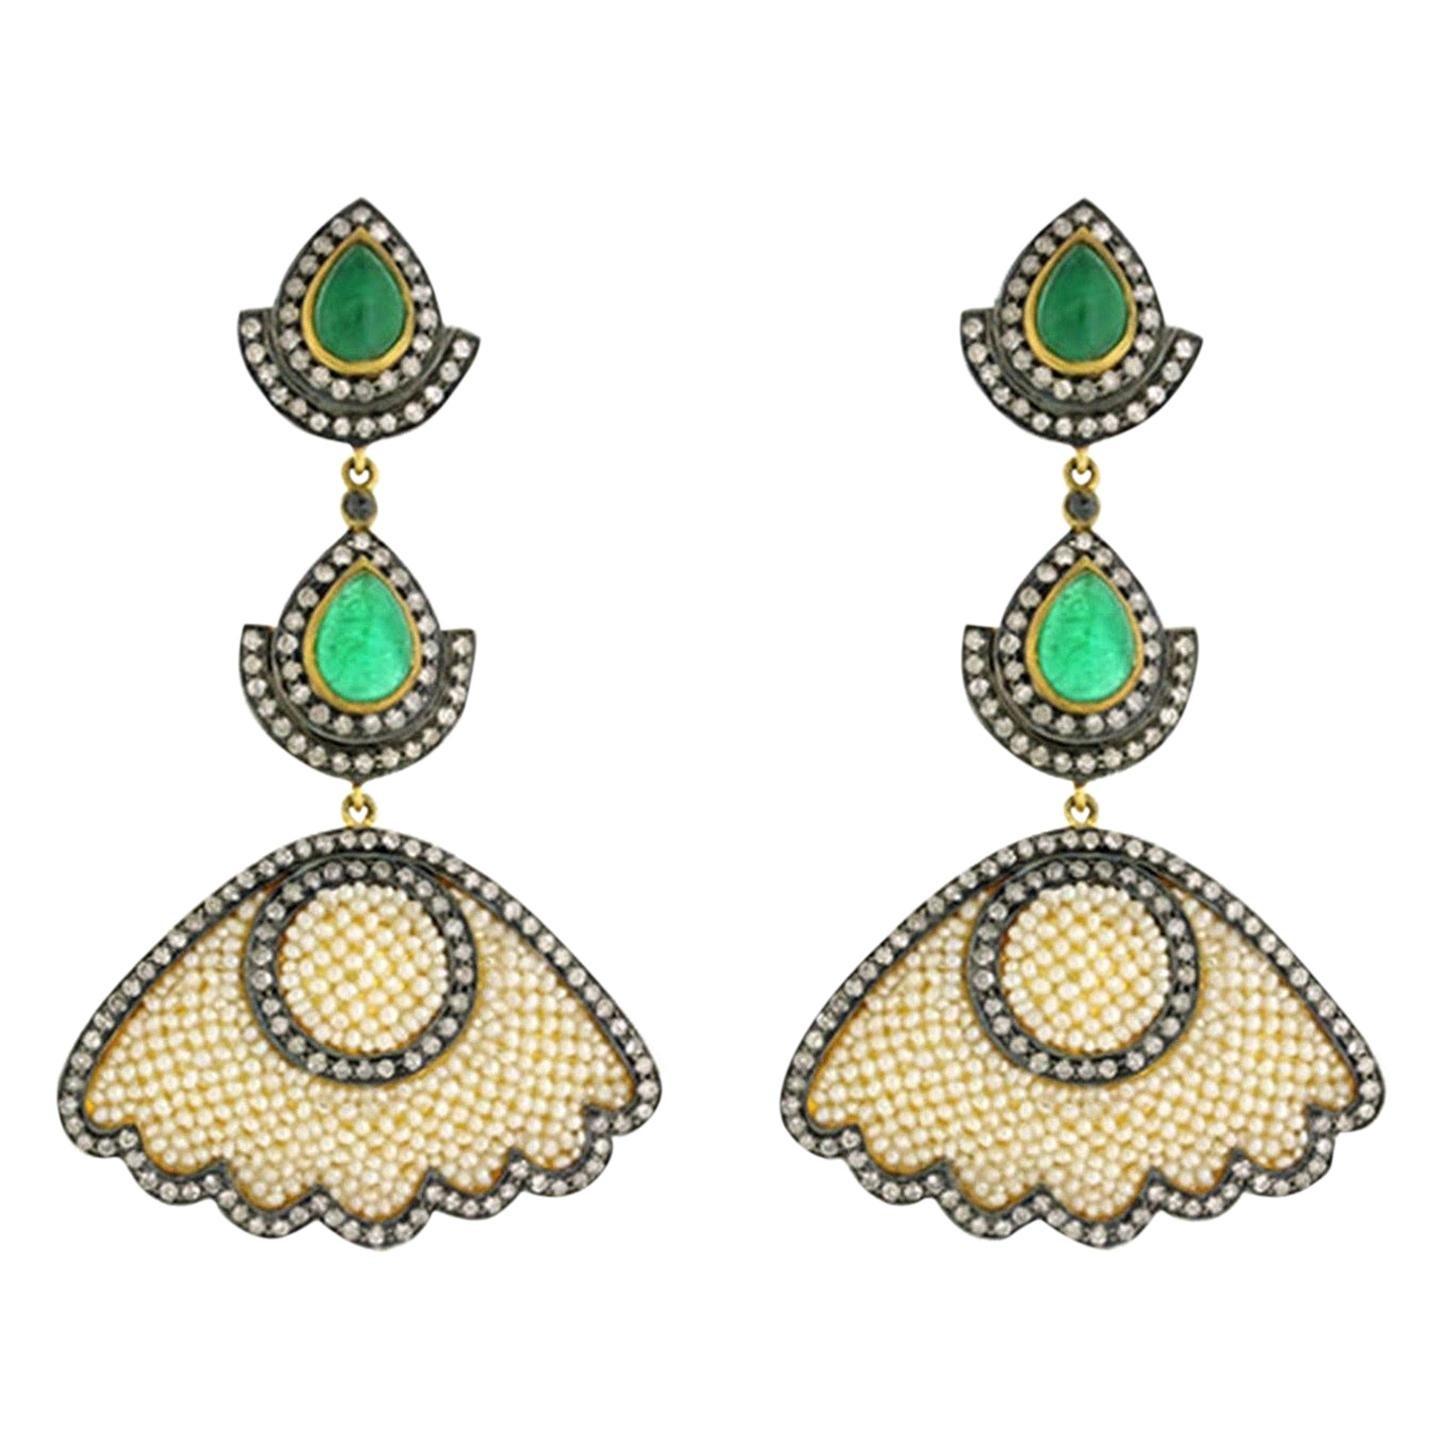 7.08 Carat Emerald Pearl Diamond Earrings